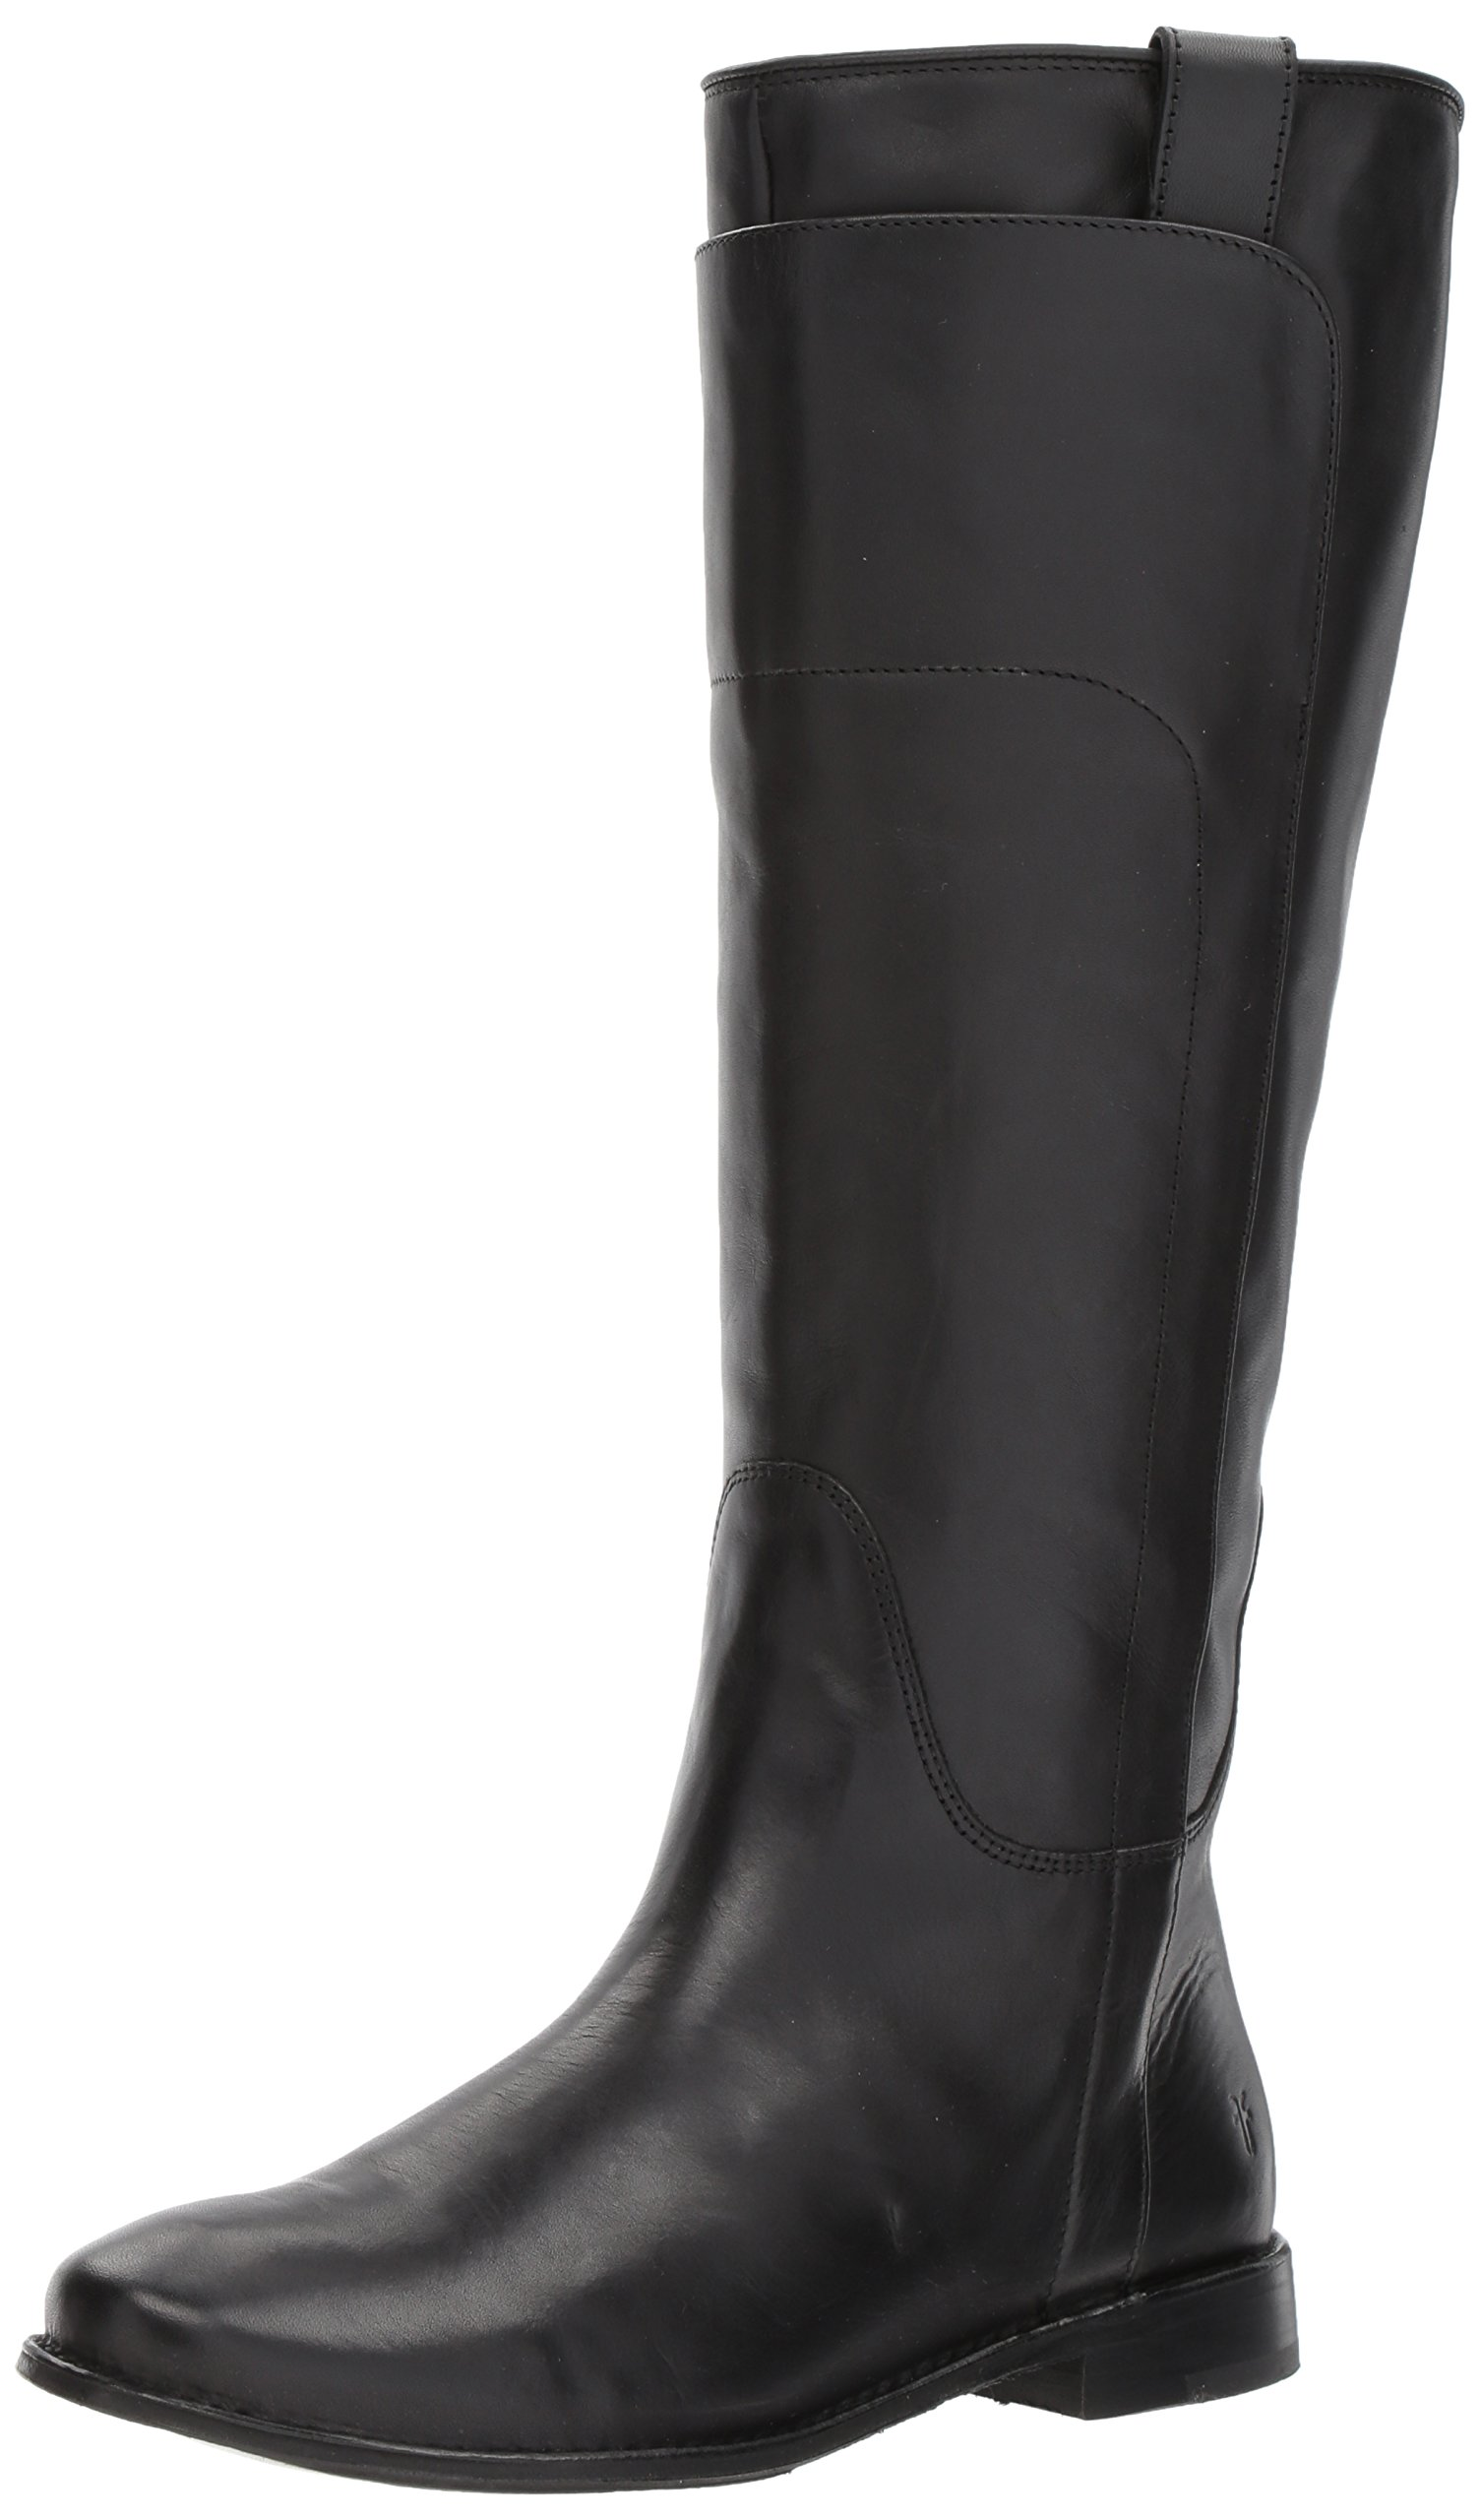 FRYE Women's Paige Tall Riding Boot, Black, 8.5 M US